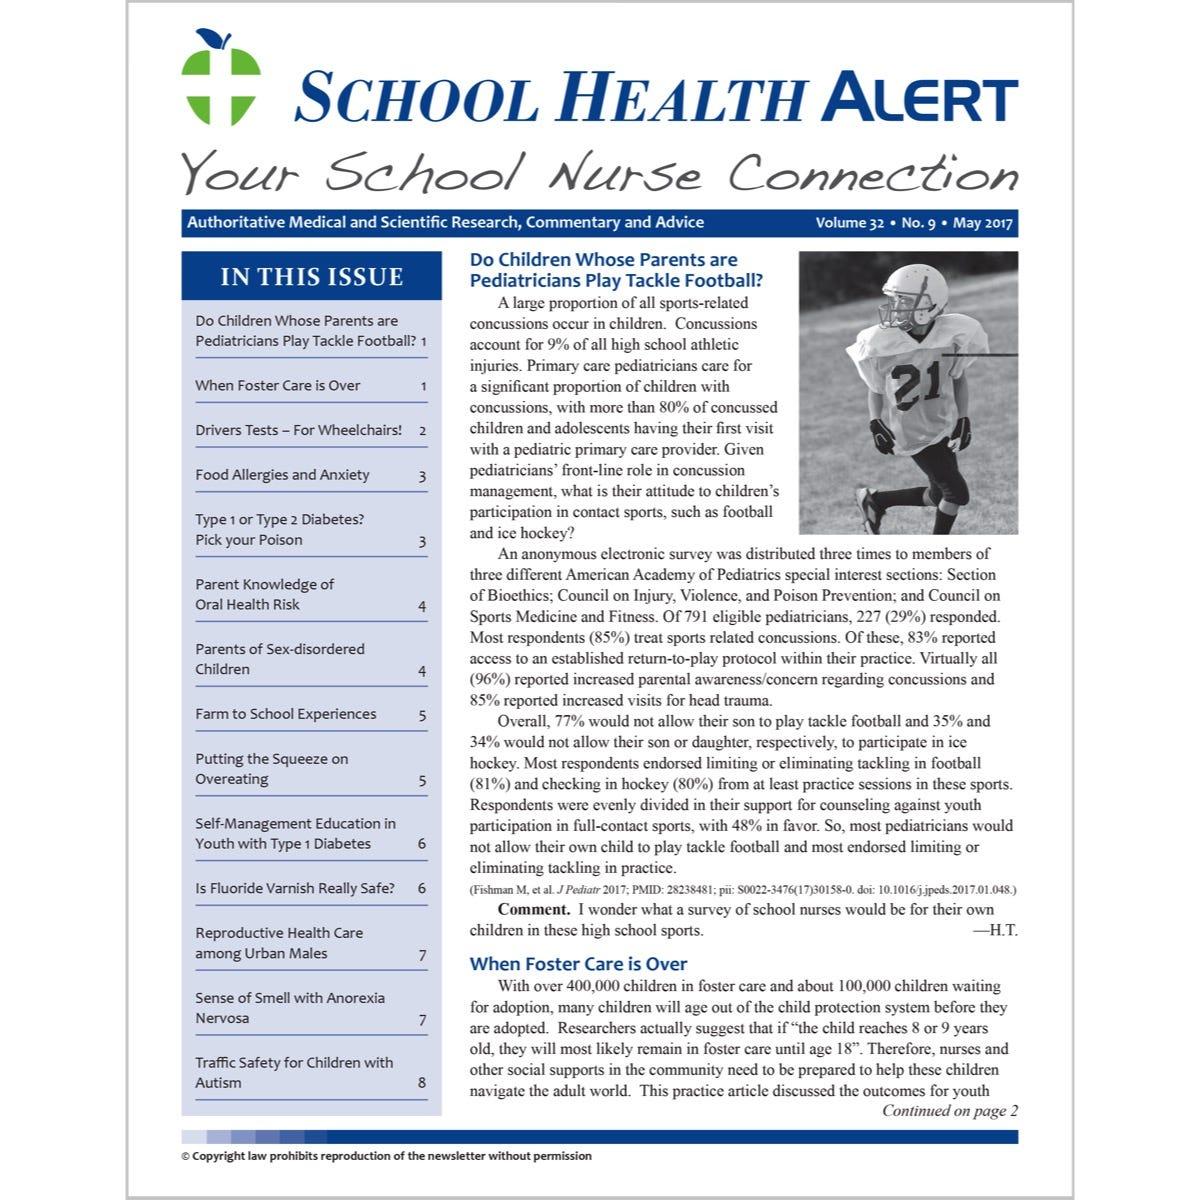 School Health Alert Subscription